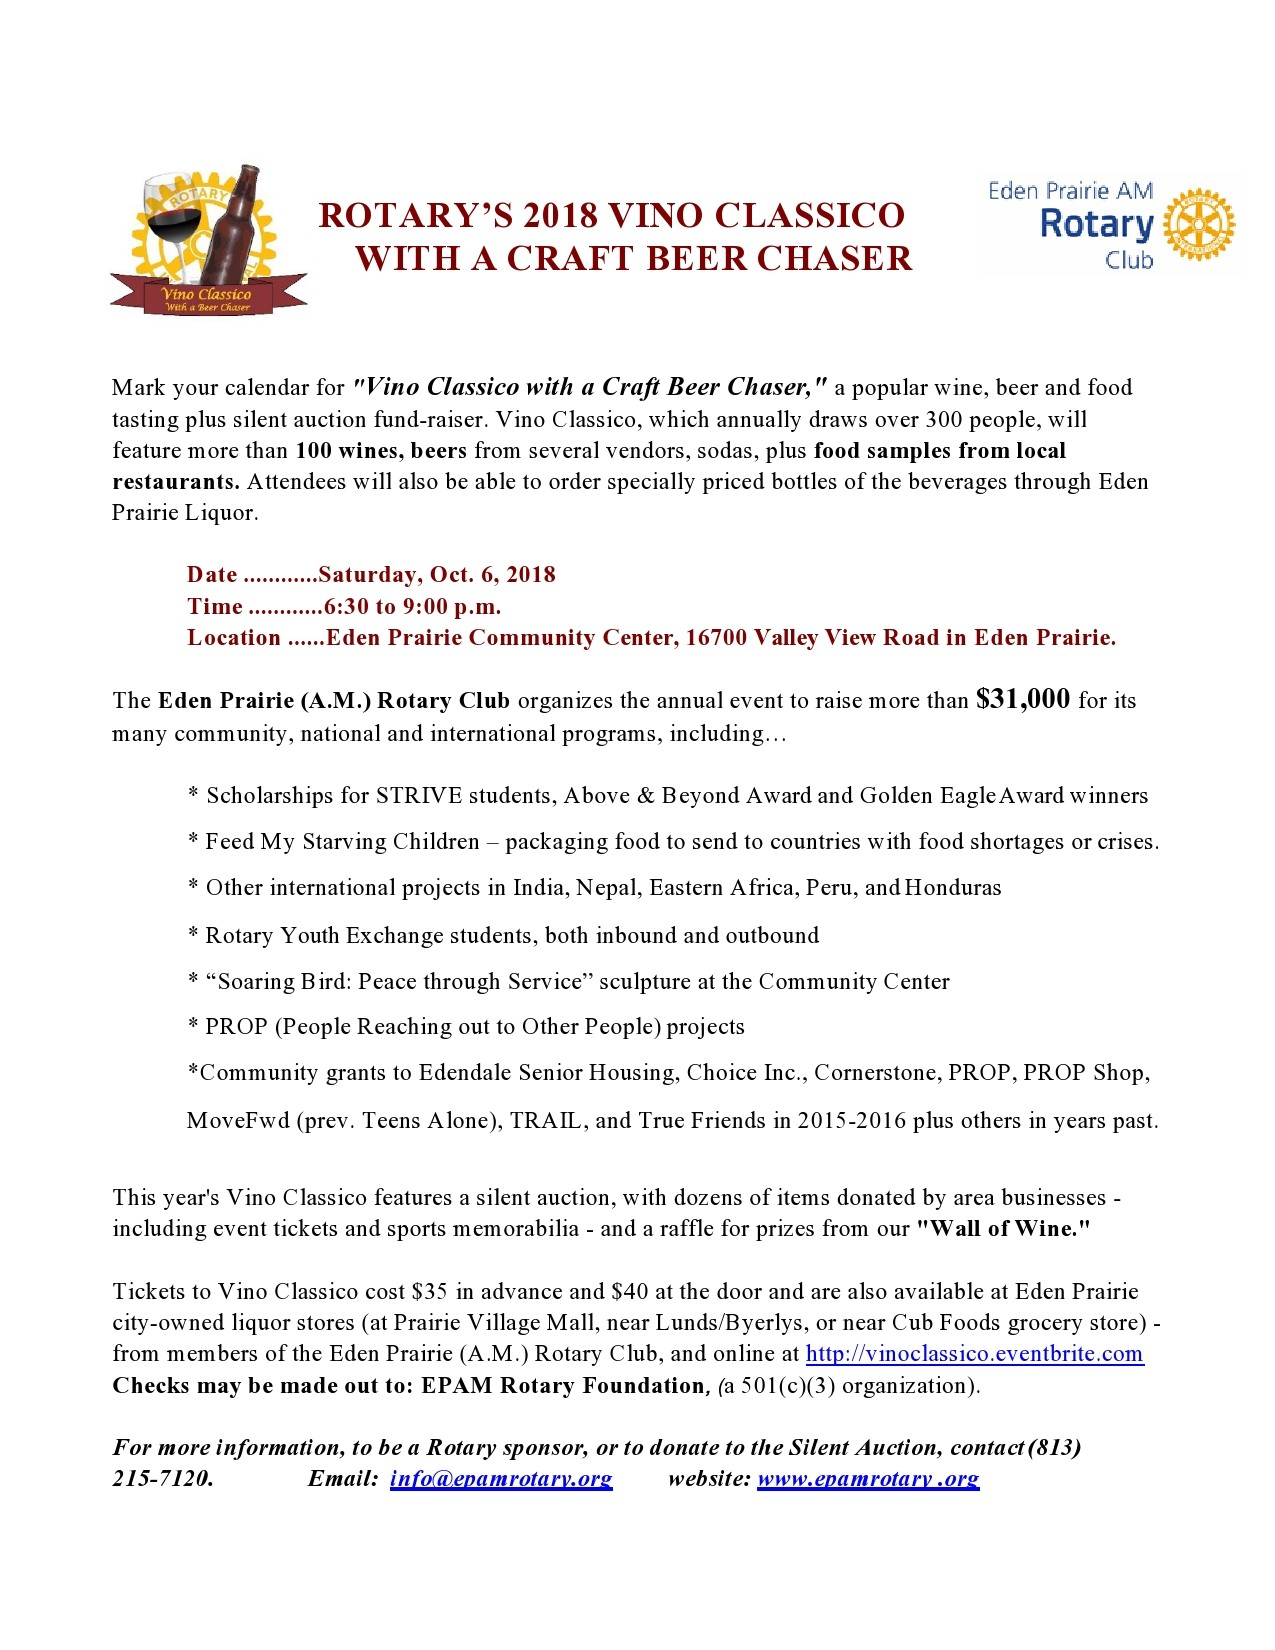 Free fundraiser flyer 31